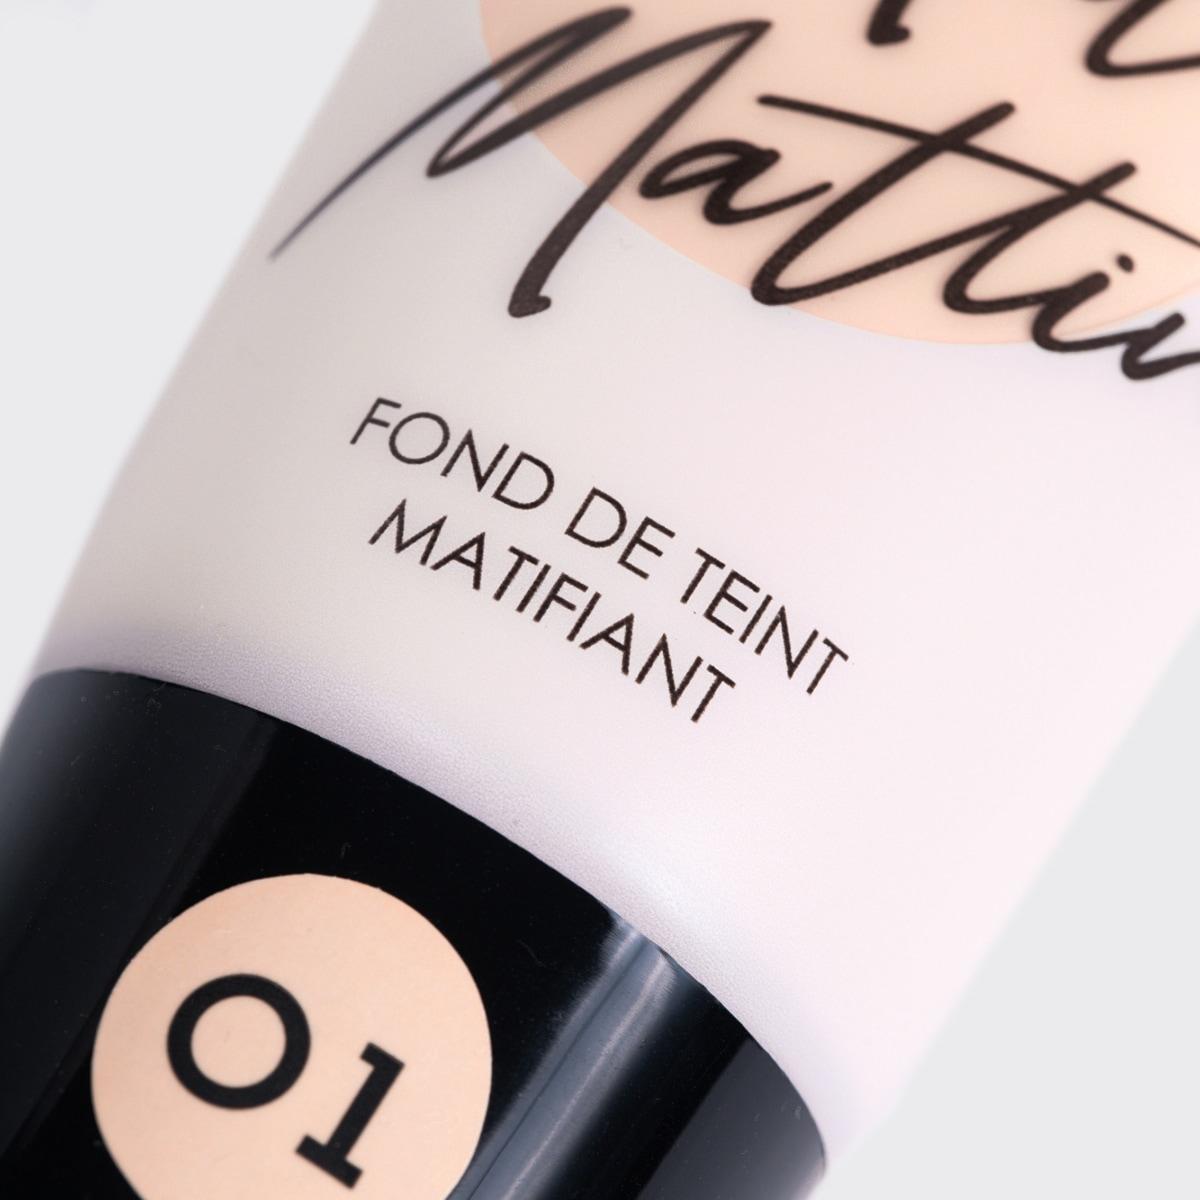 Vivienne Sabo - Mat Mattin Foundation